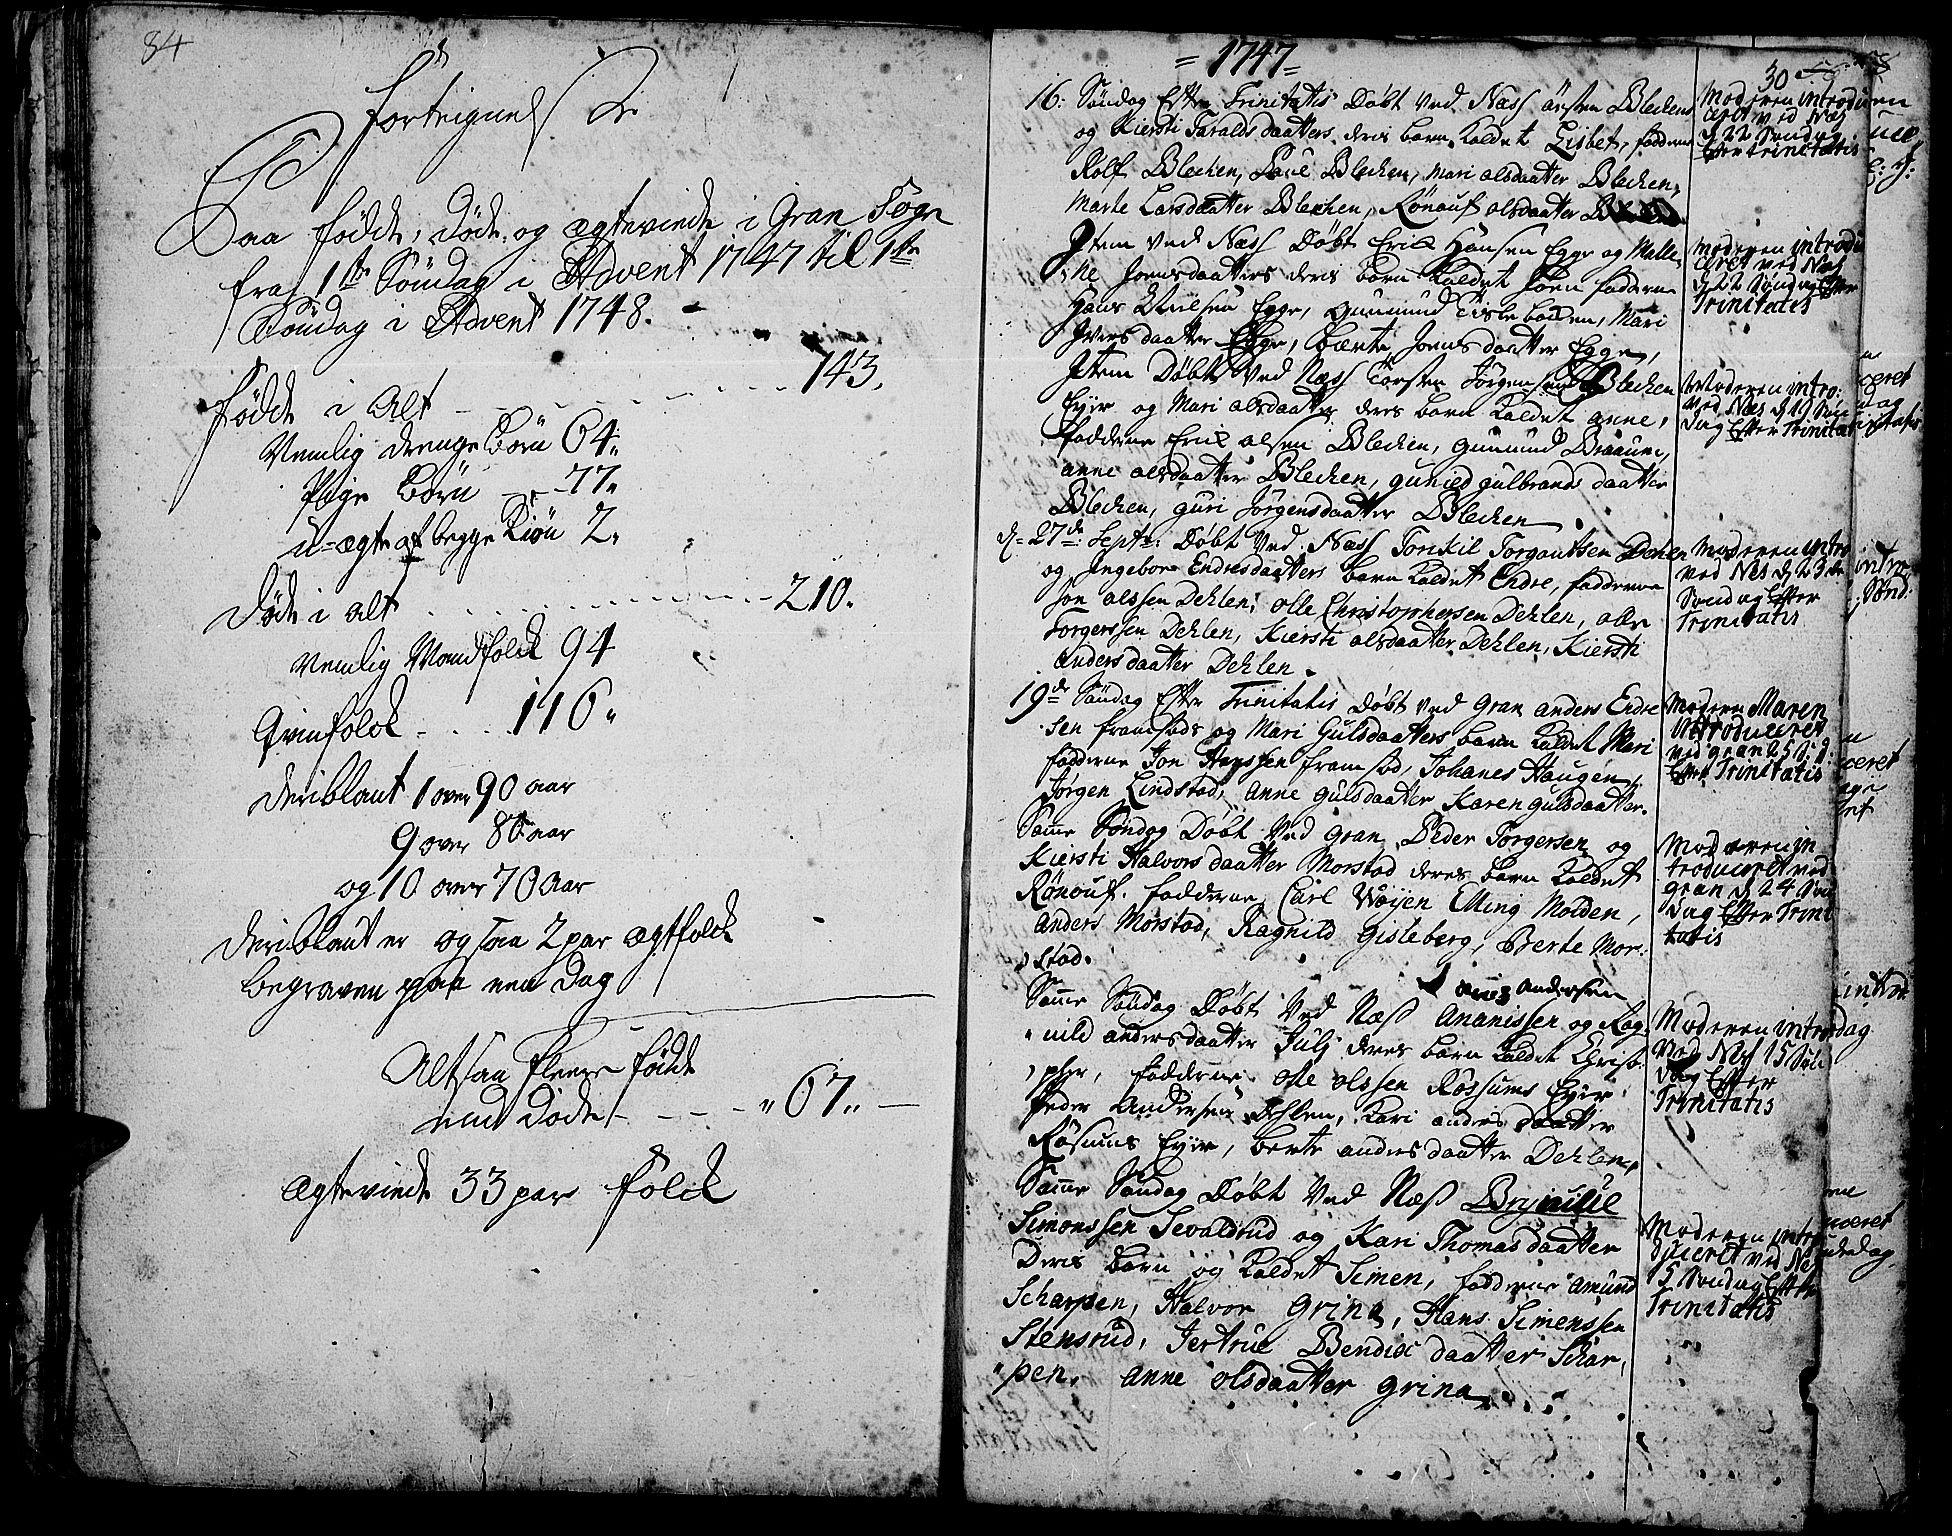 SAH, Gran prestekontor, Ministerialbok nr. 3, 1745-1758, s. 30